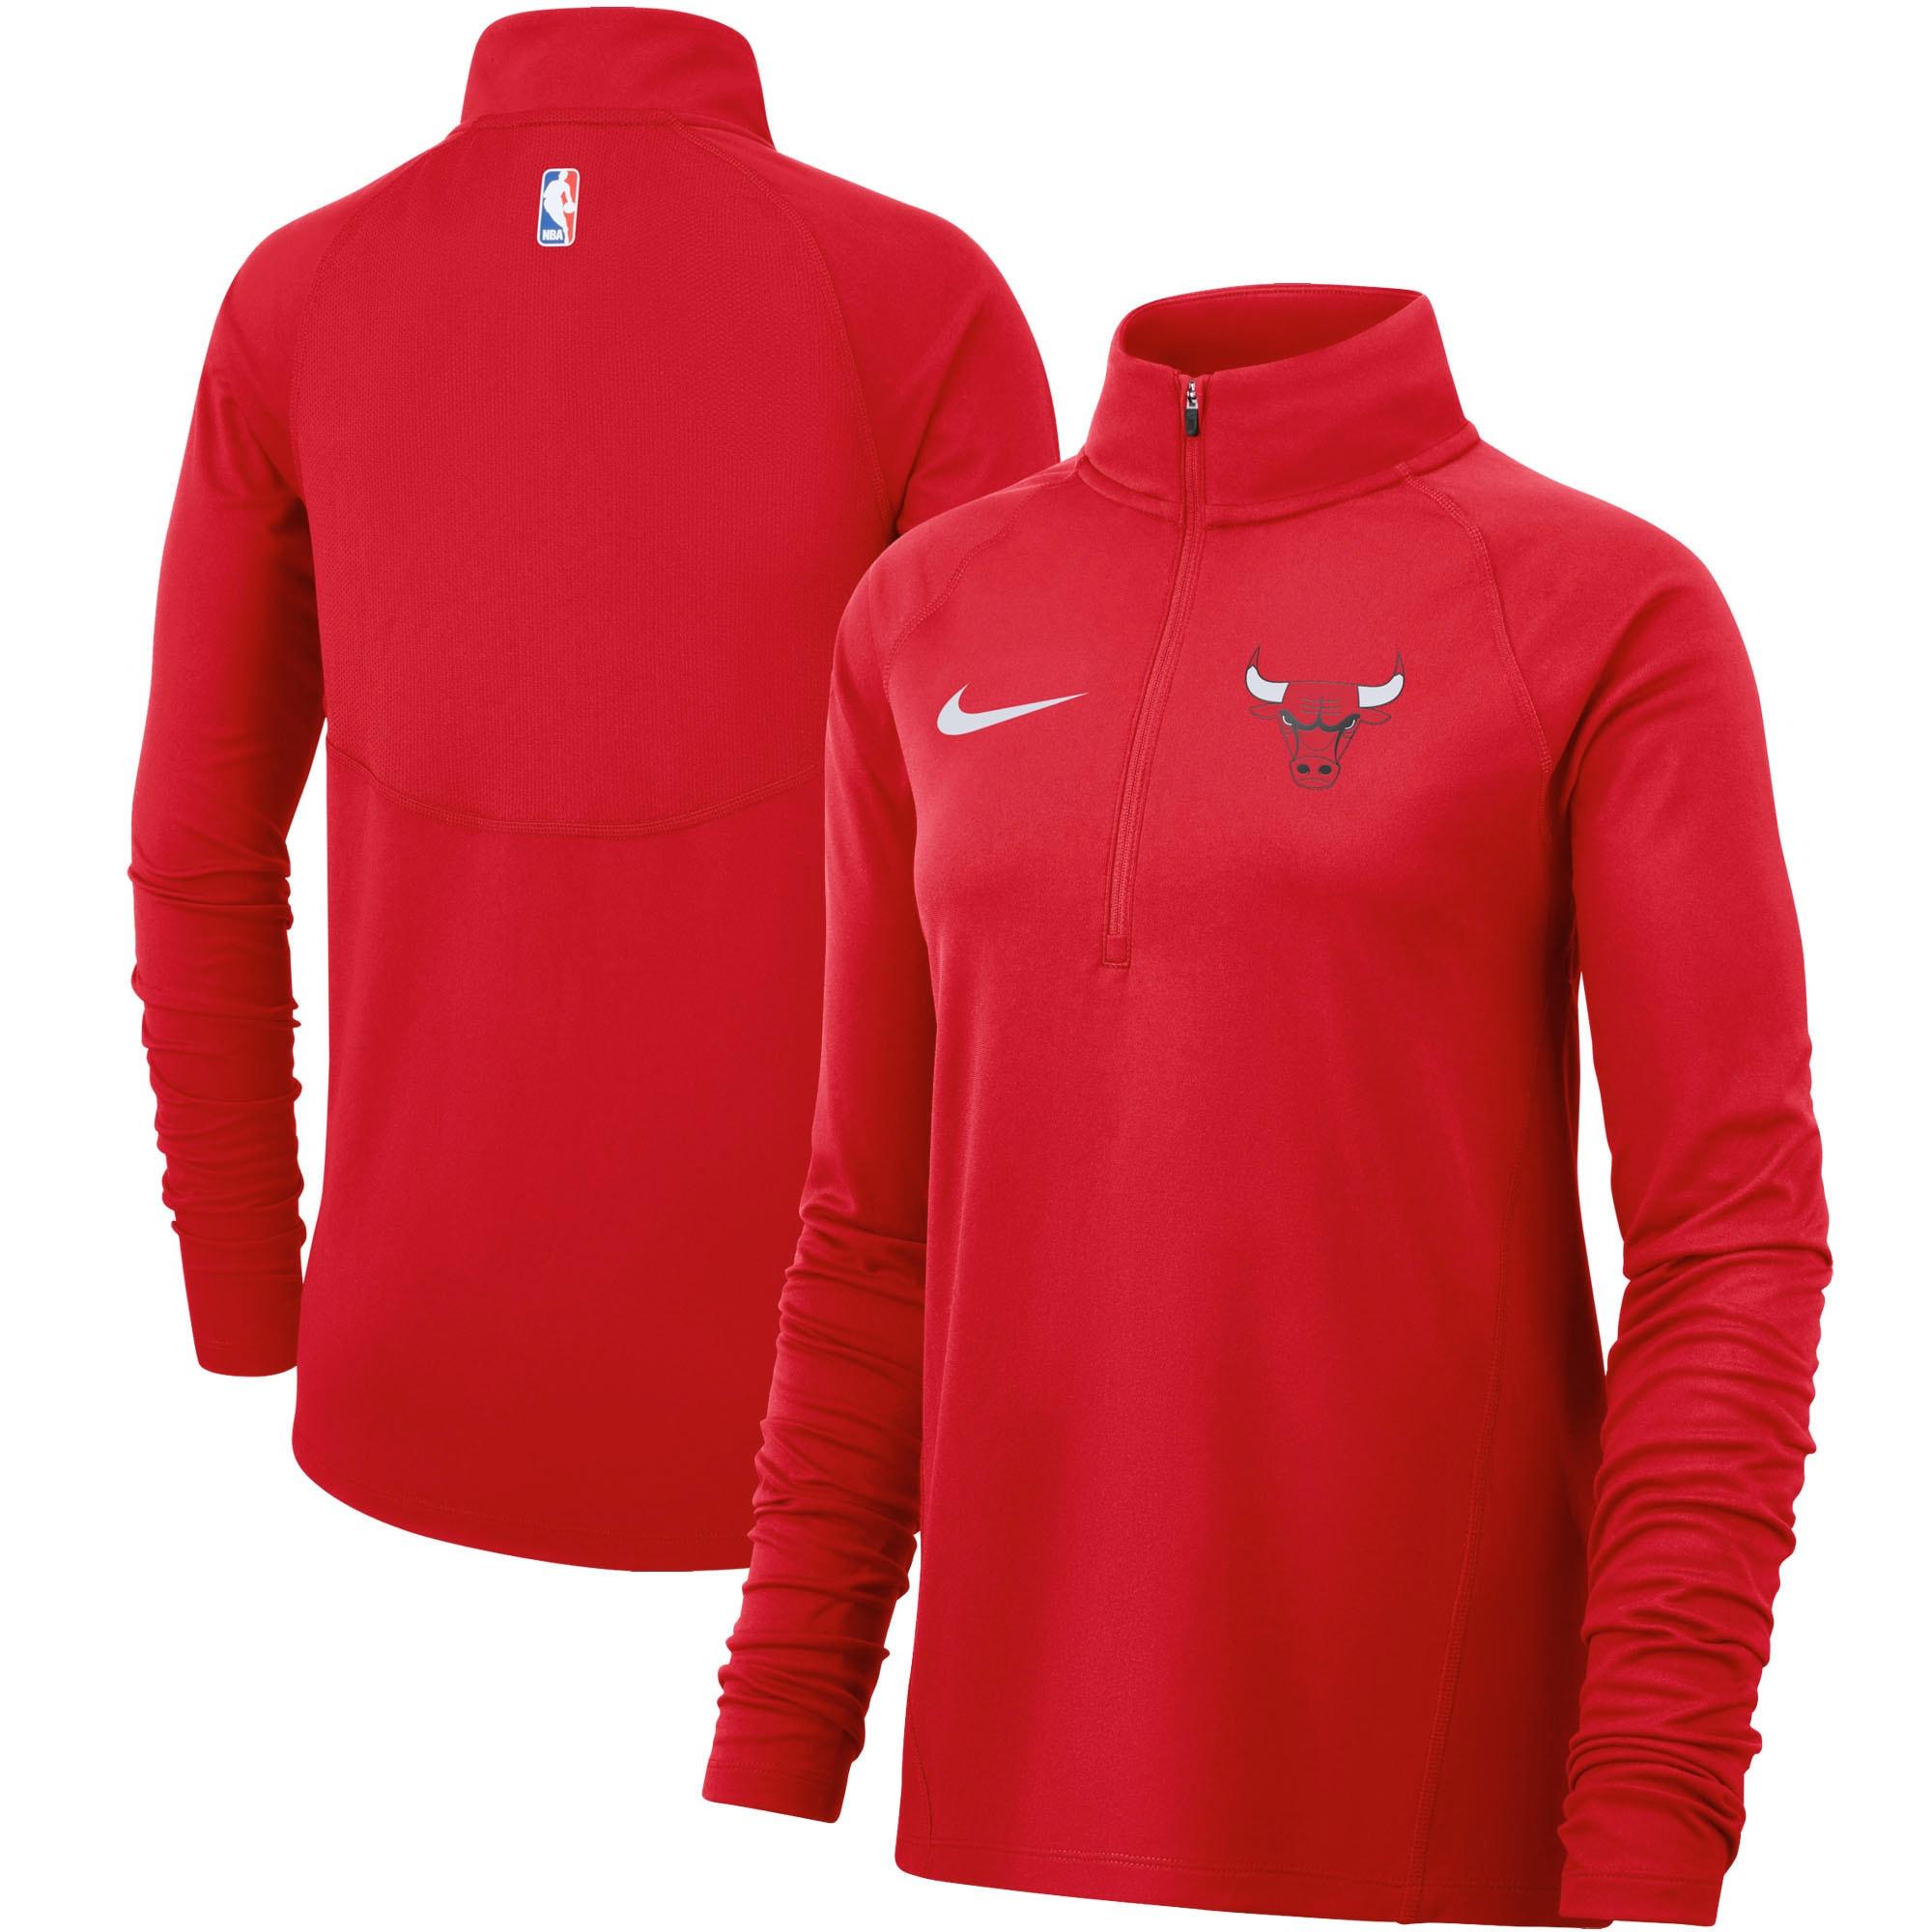 Chicago Bulls Nike Women's Element Performance Raglan Sleeve Half-Zip Pullover Jacket - Red